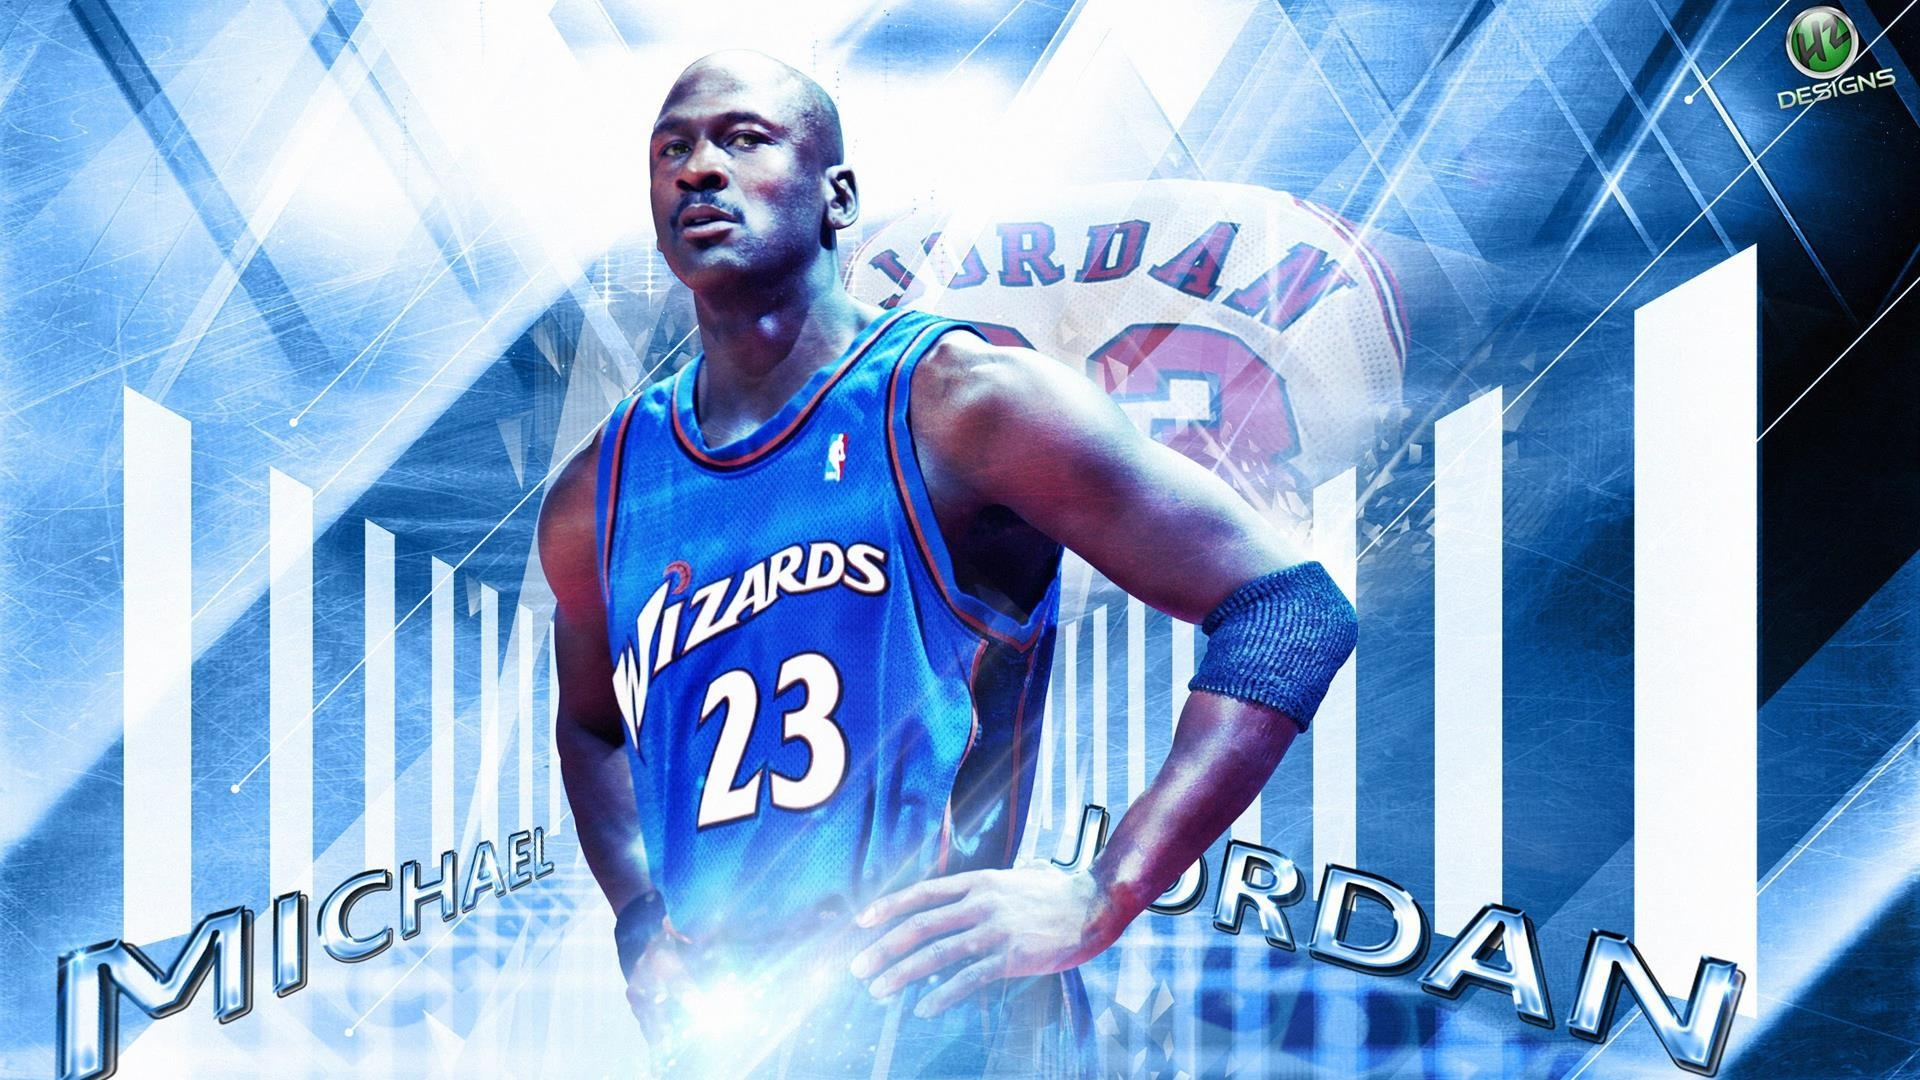 Michael Jordan windows background